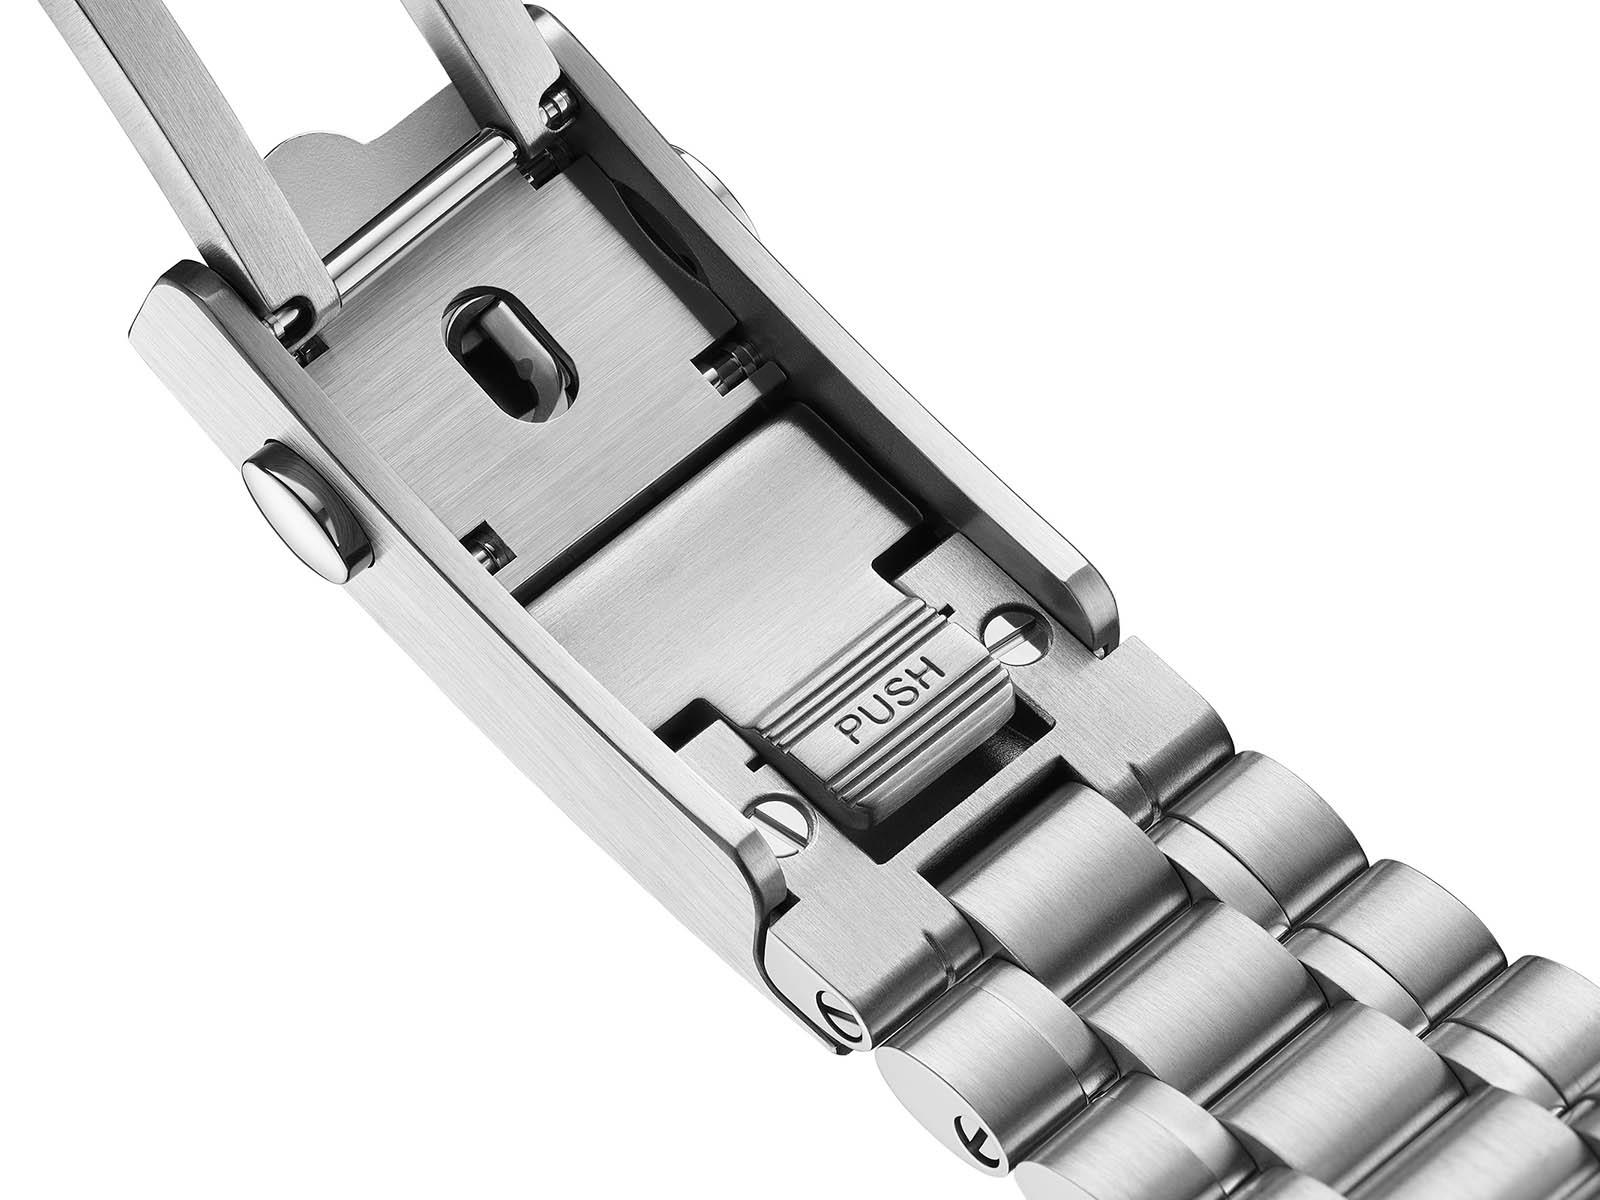 omega-speedmaster-chronoscope-co-axial-master-chronometer-chronograph-9.jpg